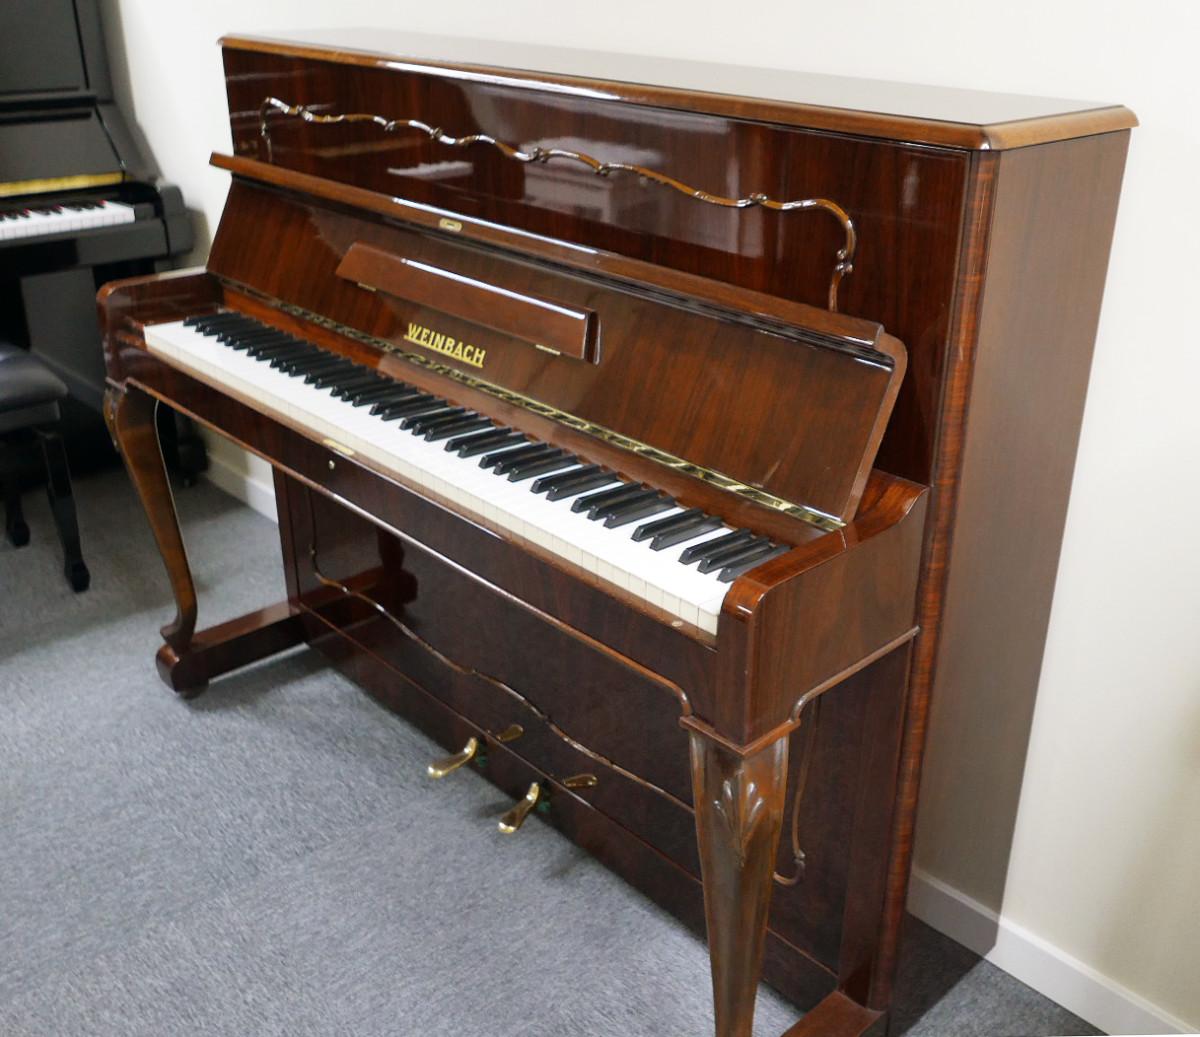 piano vertical Weinbach 115 #157122 vista general tapa abiert